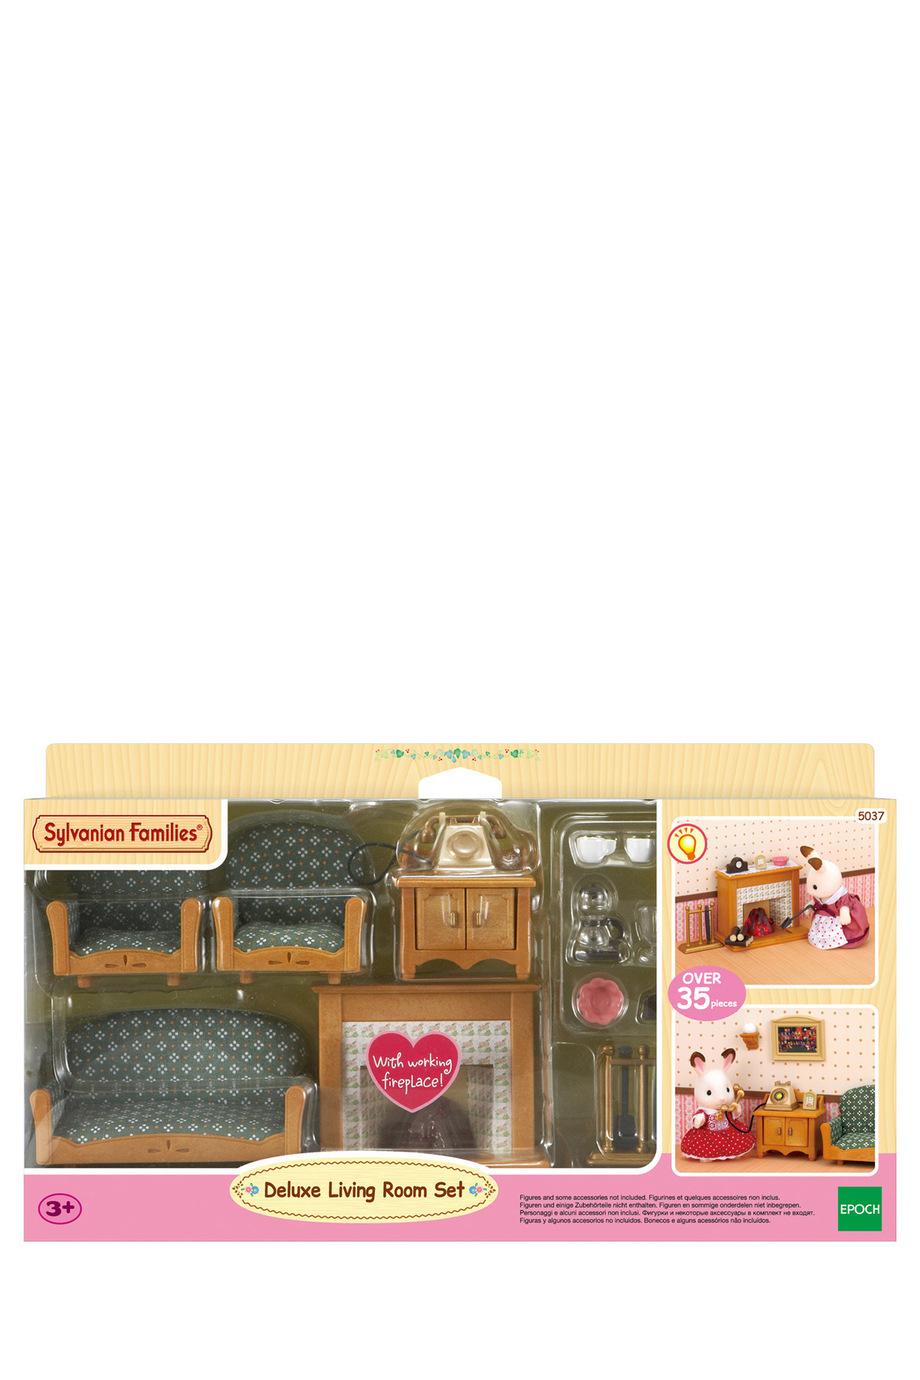 Sylvanian Families | Deluxe Living Room Set | Myer Online